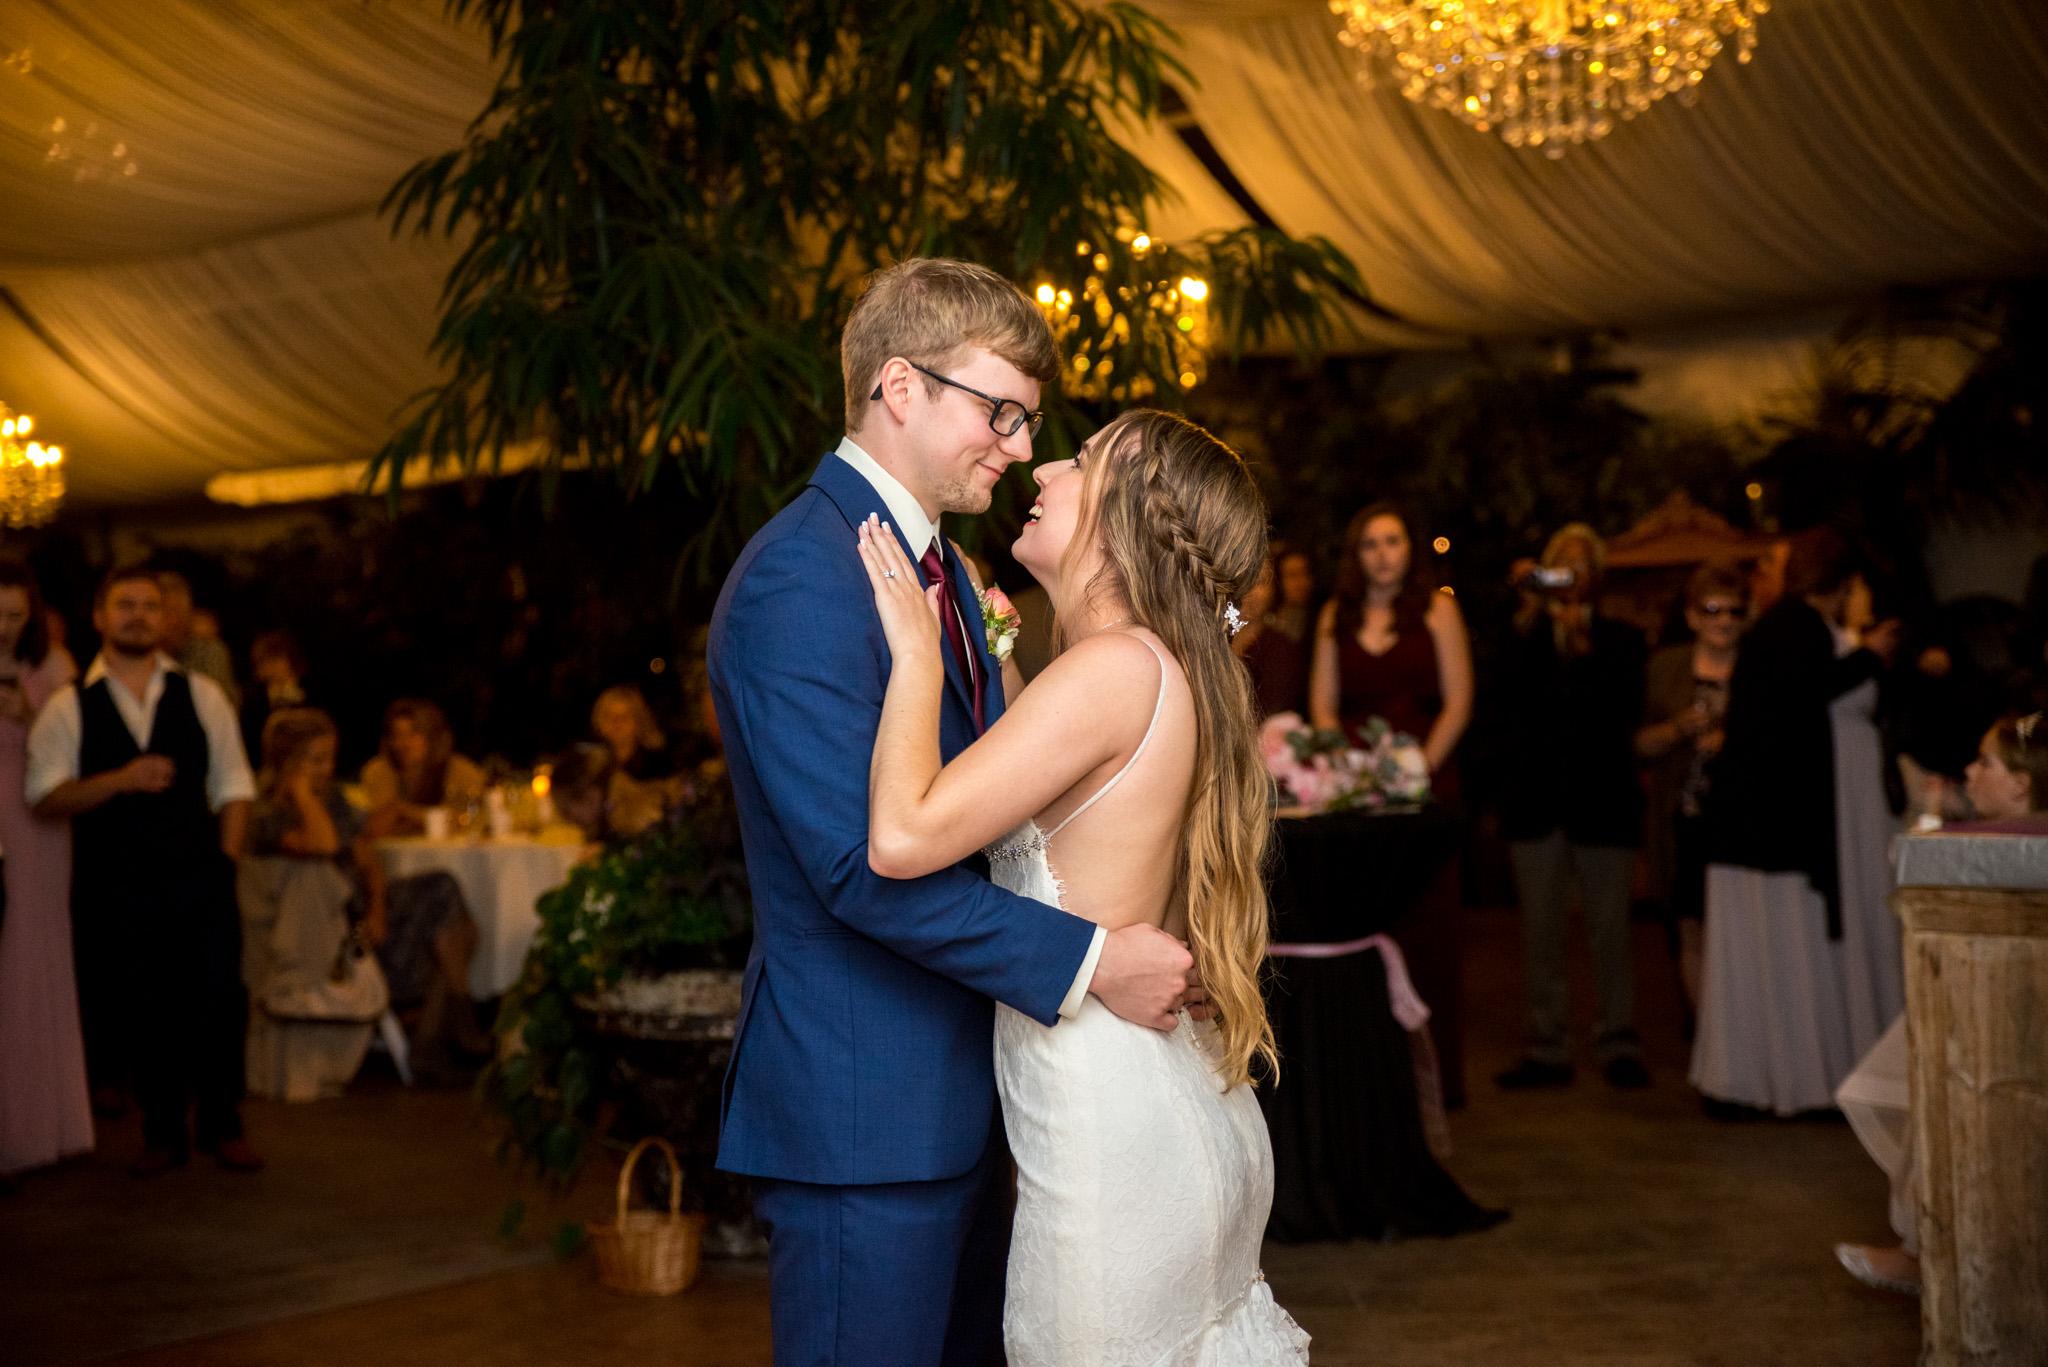 Abbotsford Wedding Photographer-87.jpg